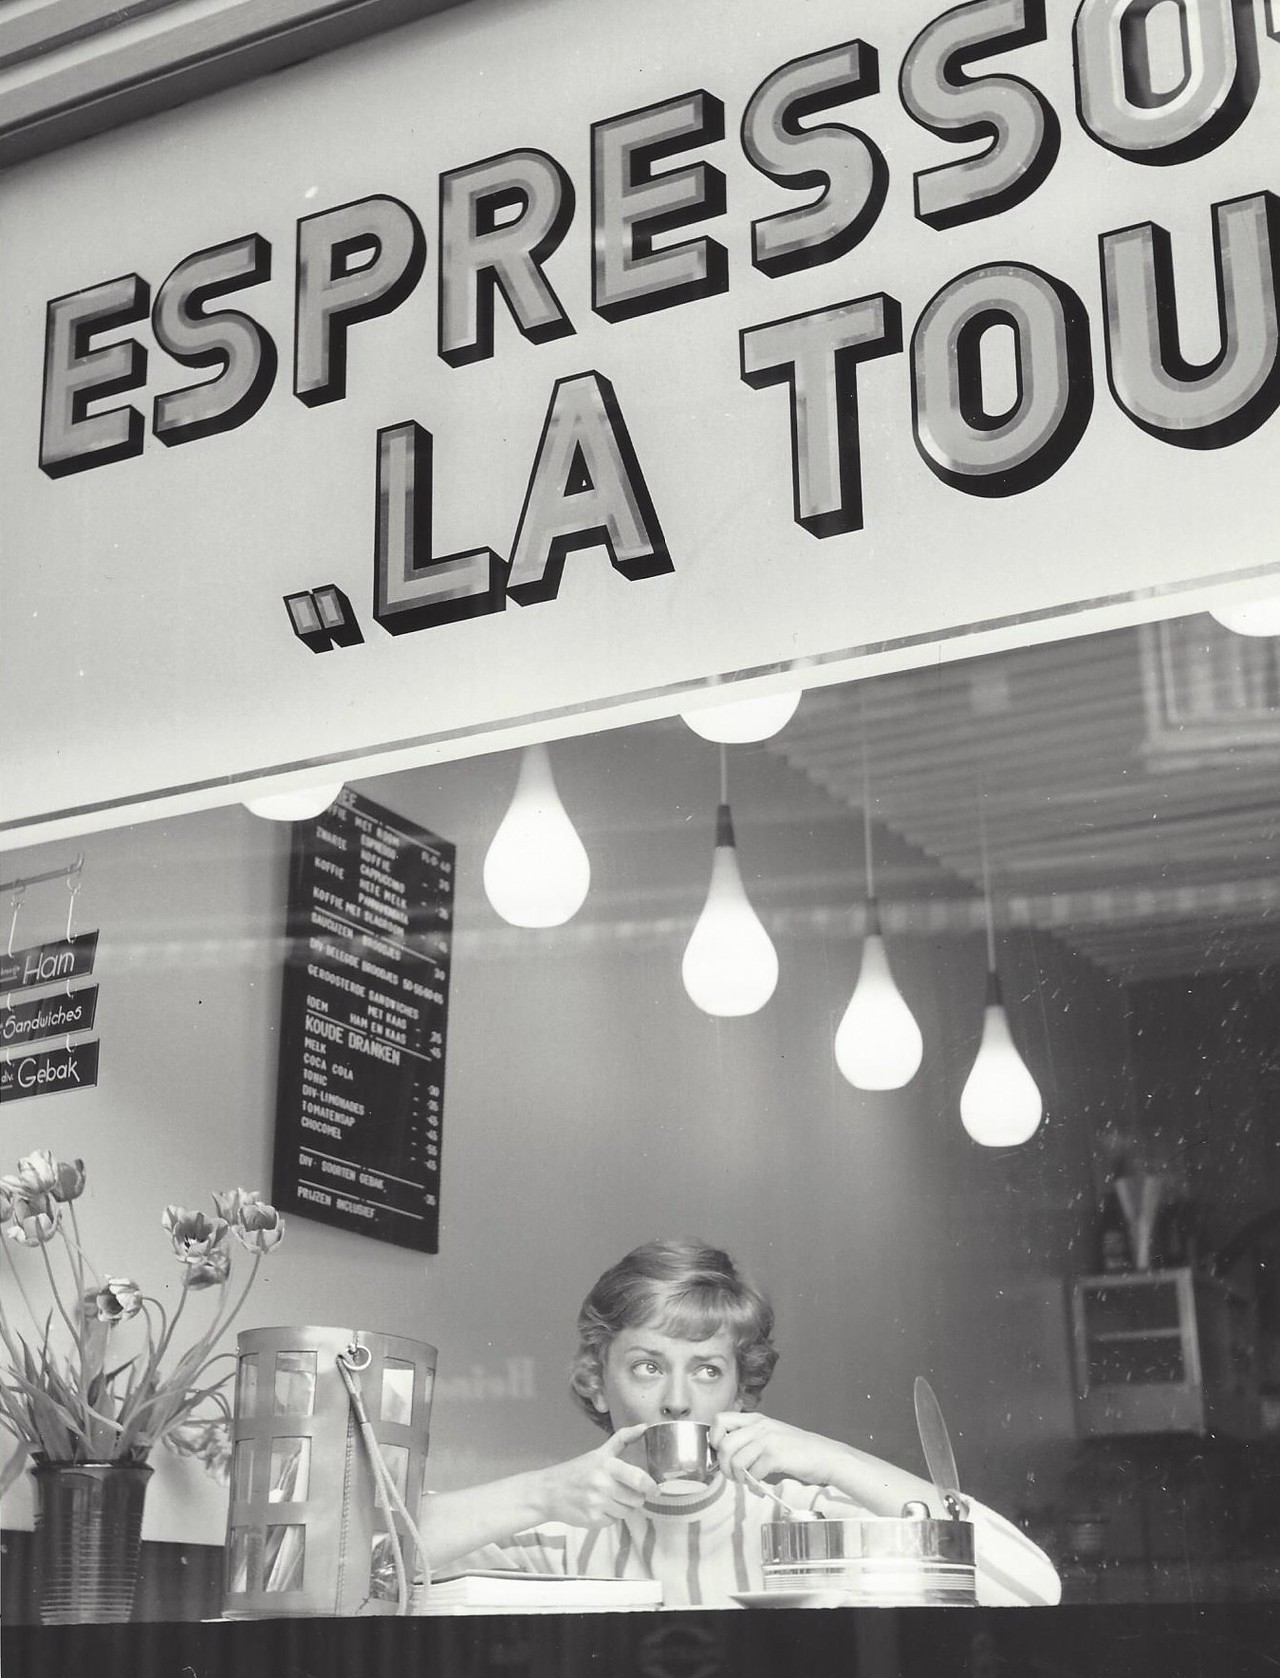 Эспрессо-бар, Амстердам, 1960-е. Фотограф Кис Шерер